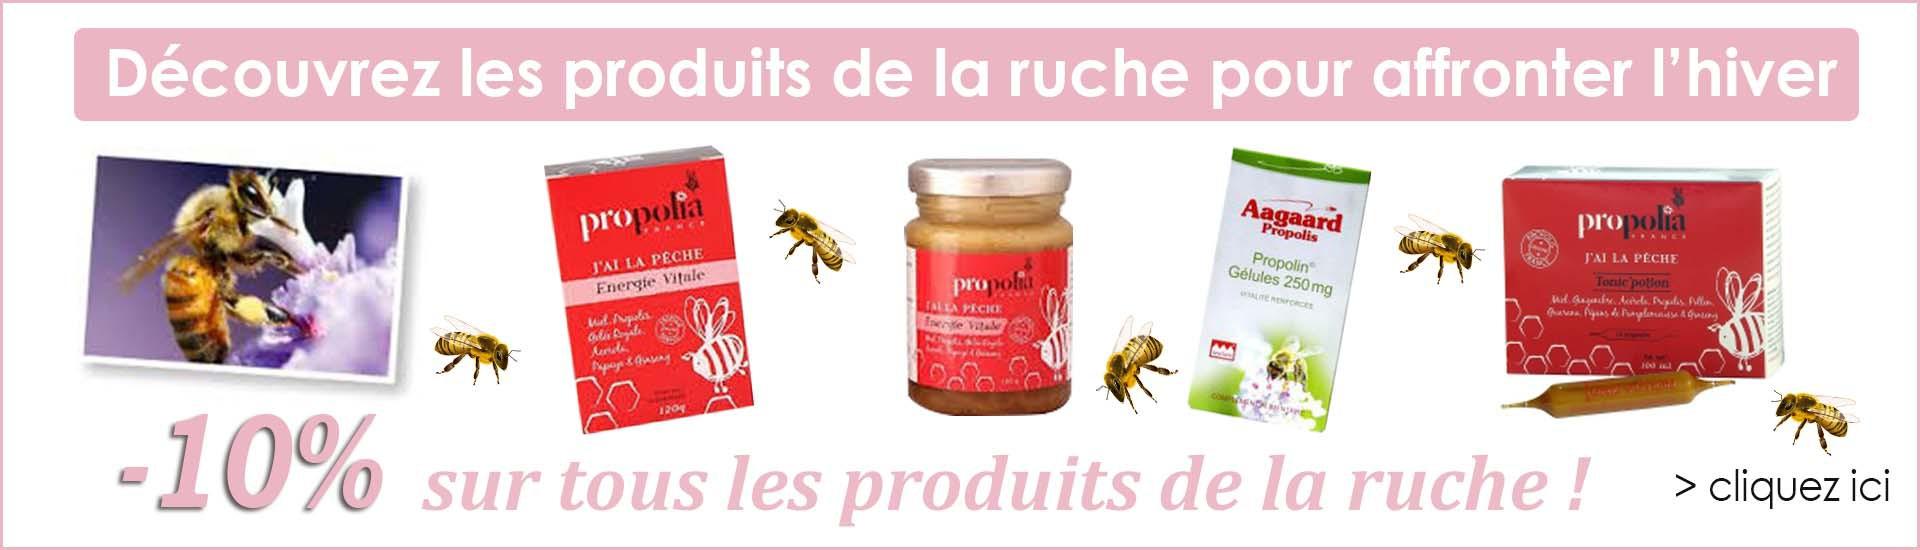 propolis produits de la ruche